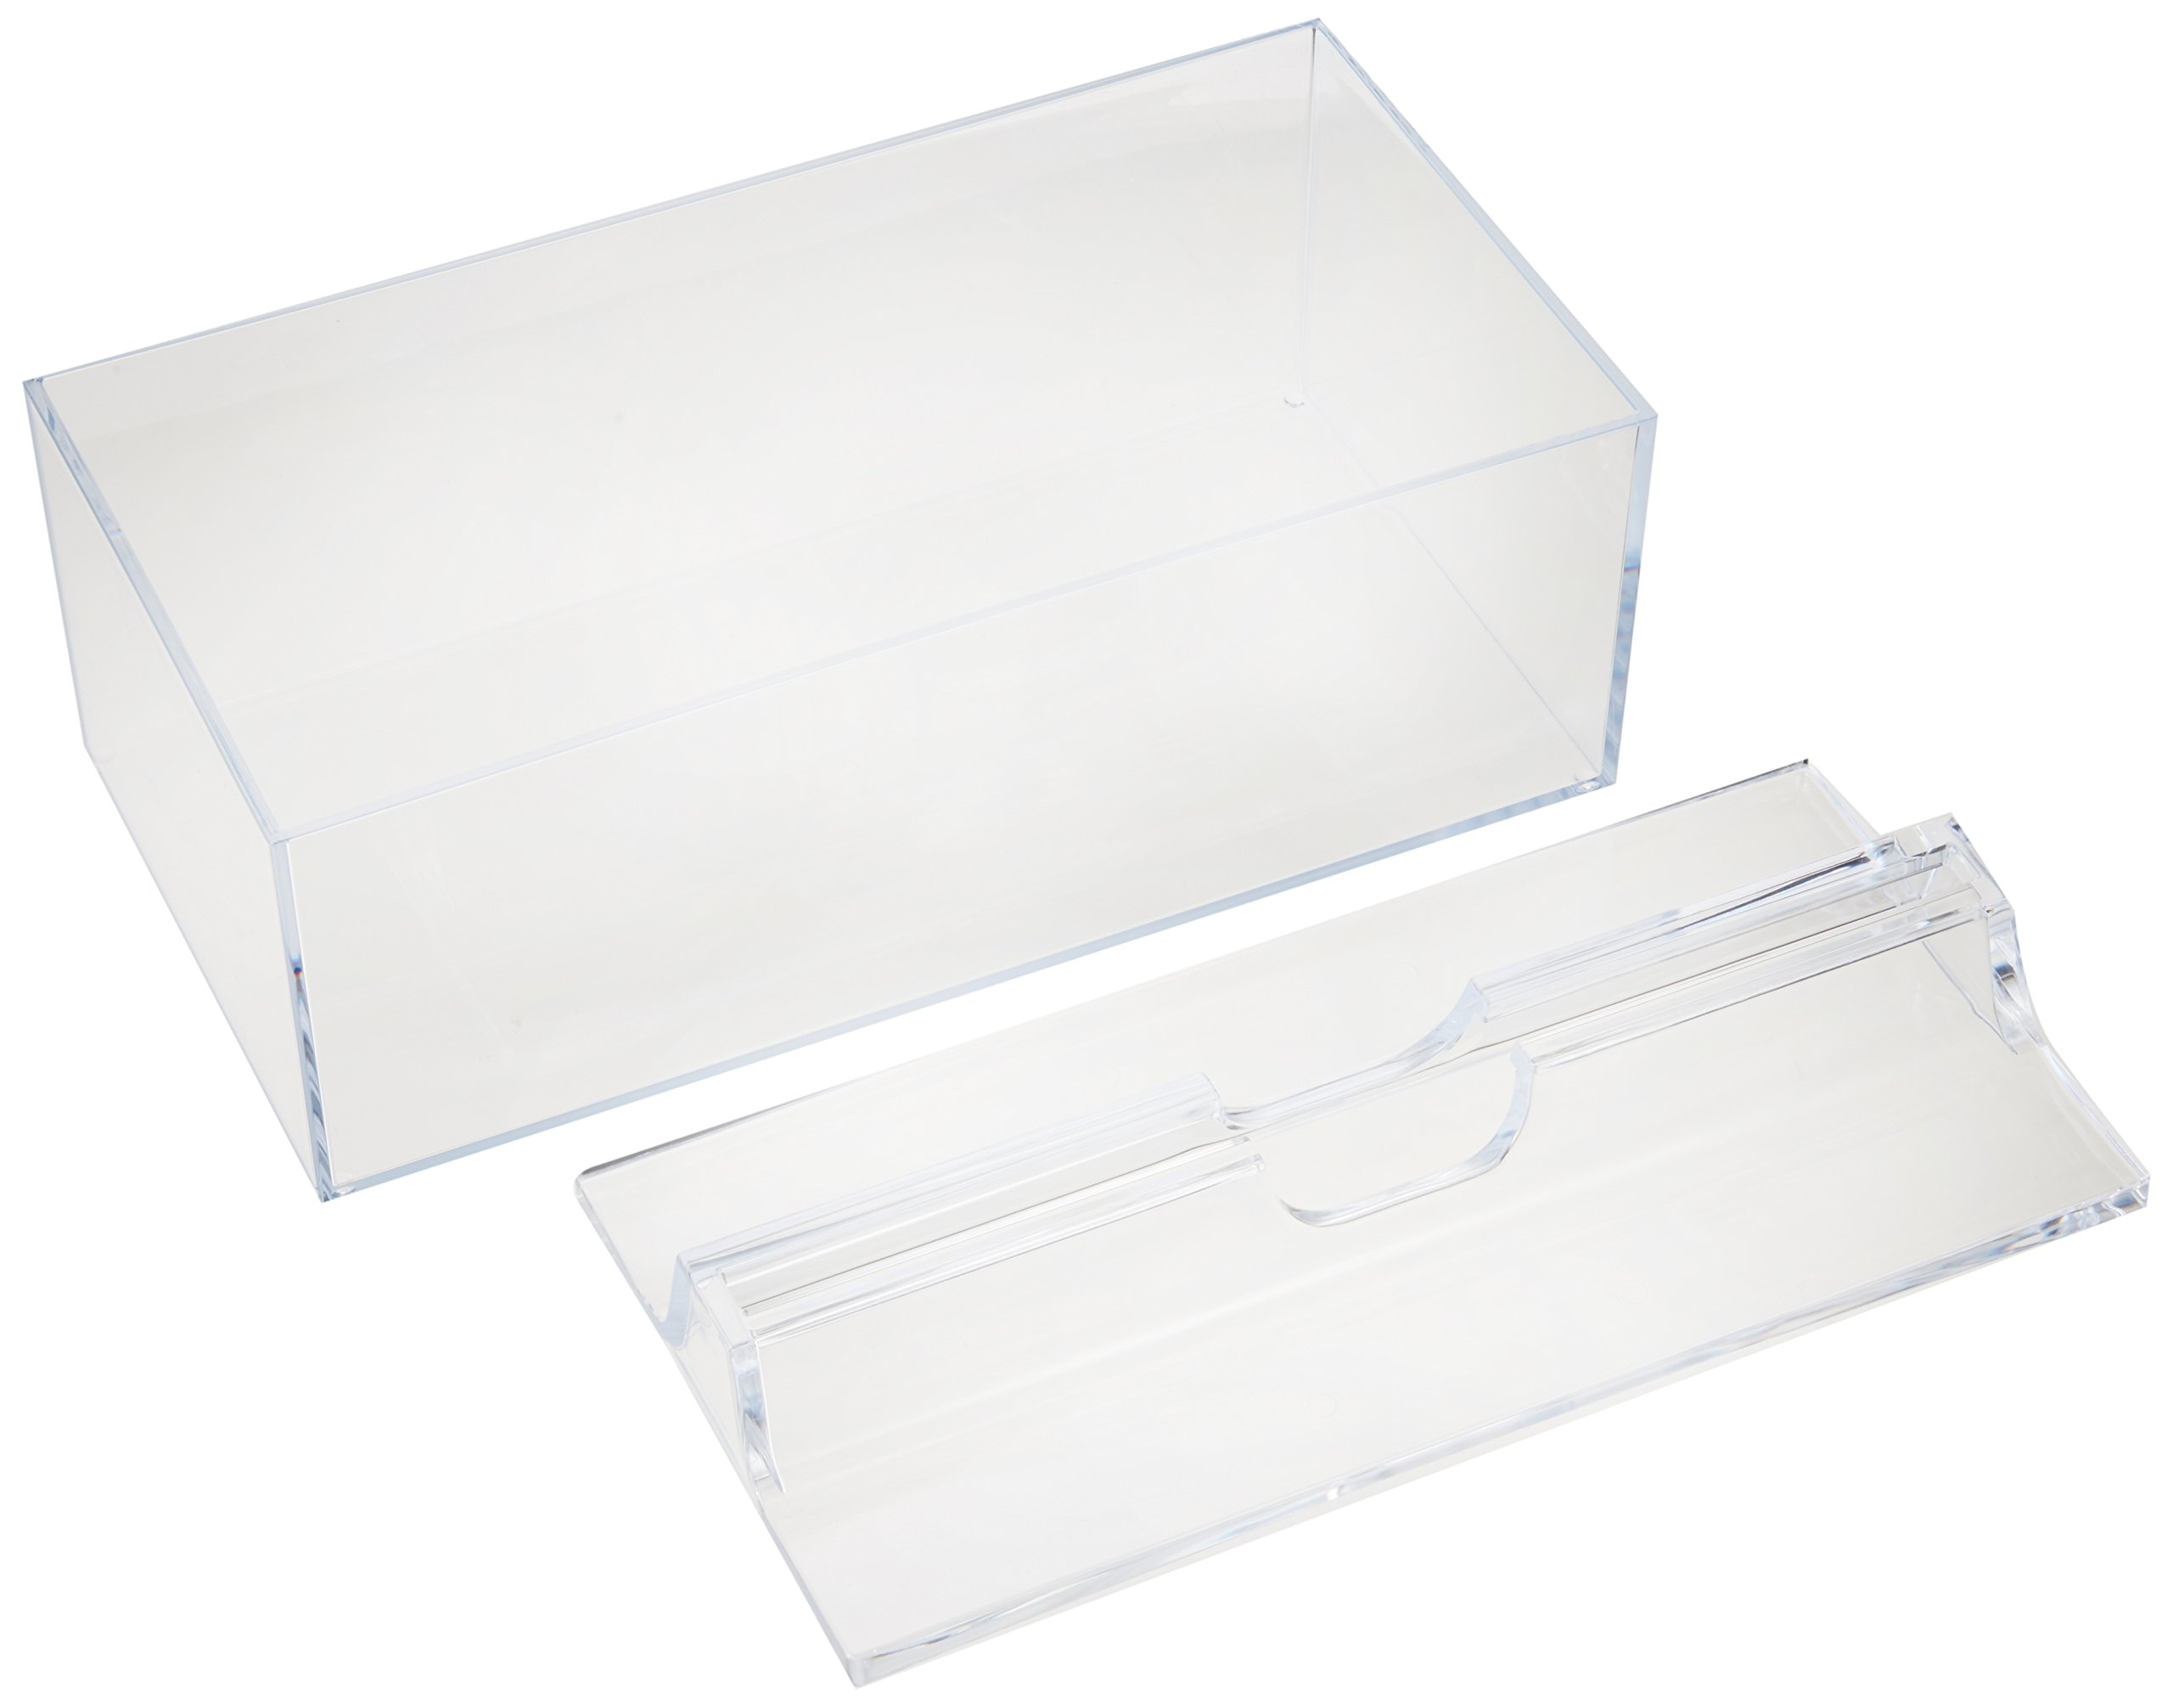 Butterfly Plastic Industrial Paper Towel Case